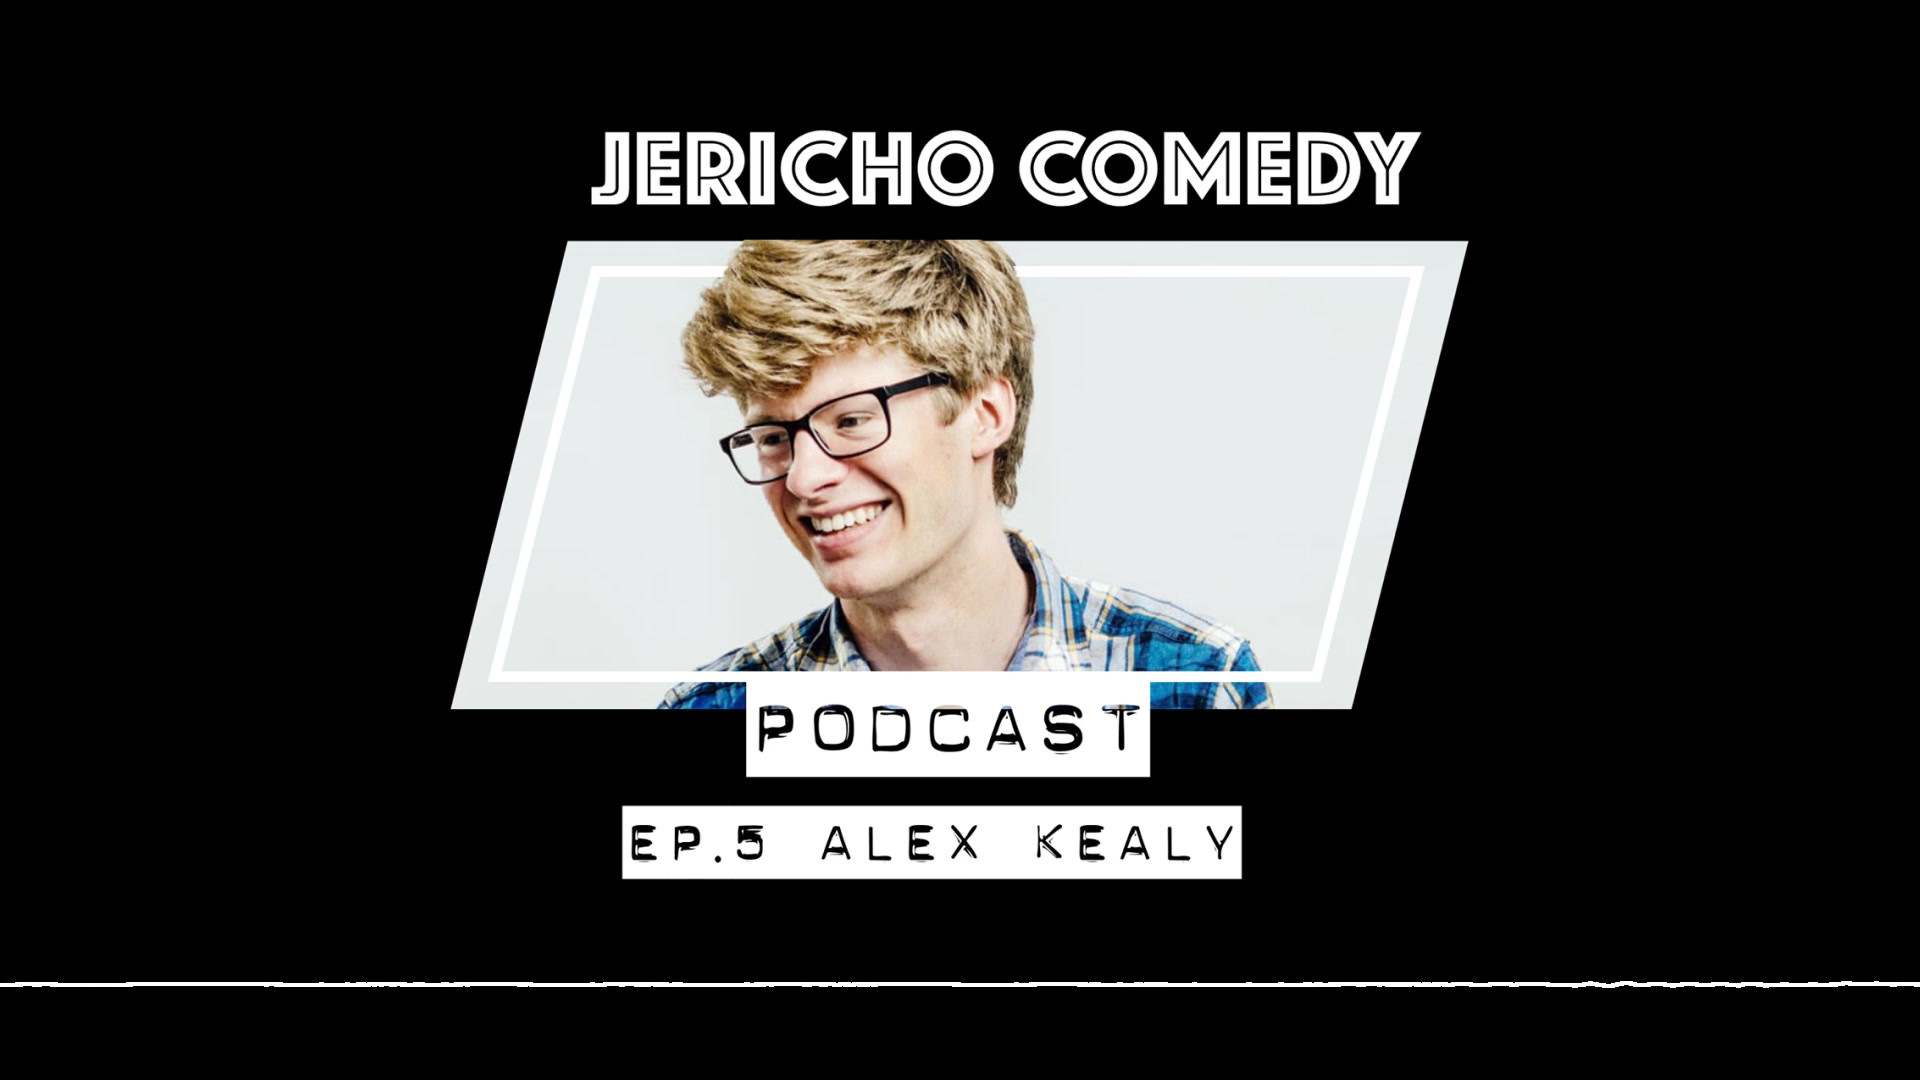 Alex Kealy on the Jericho Comedy Podcast